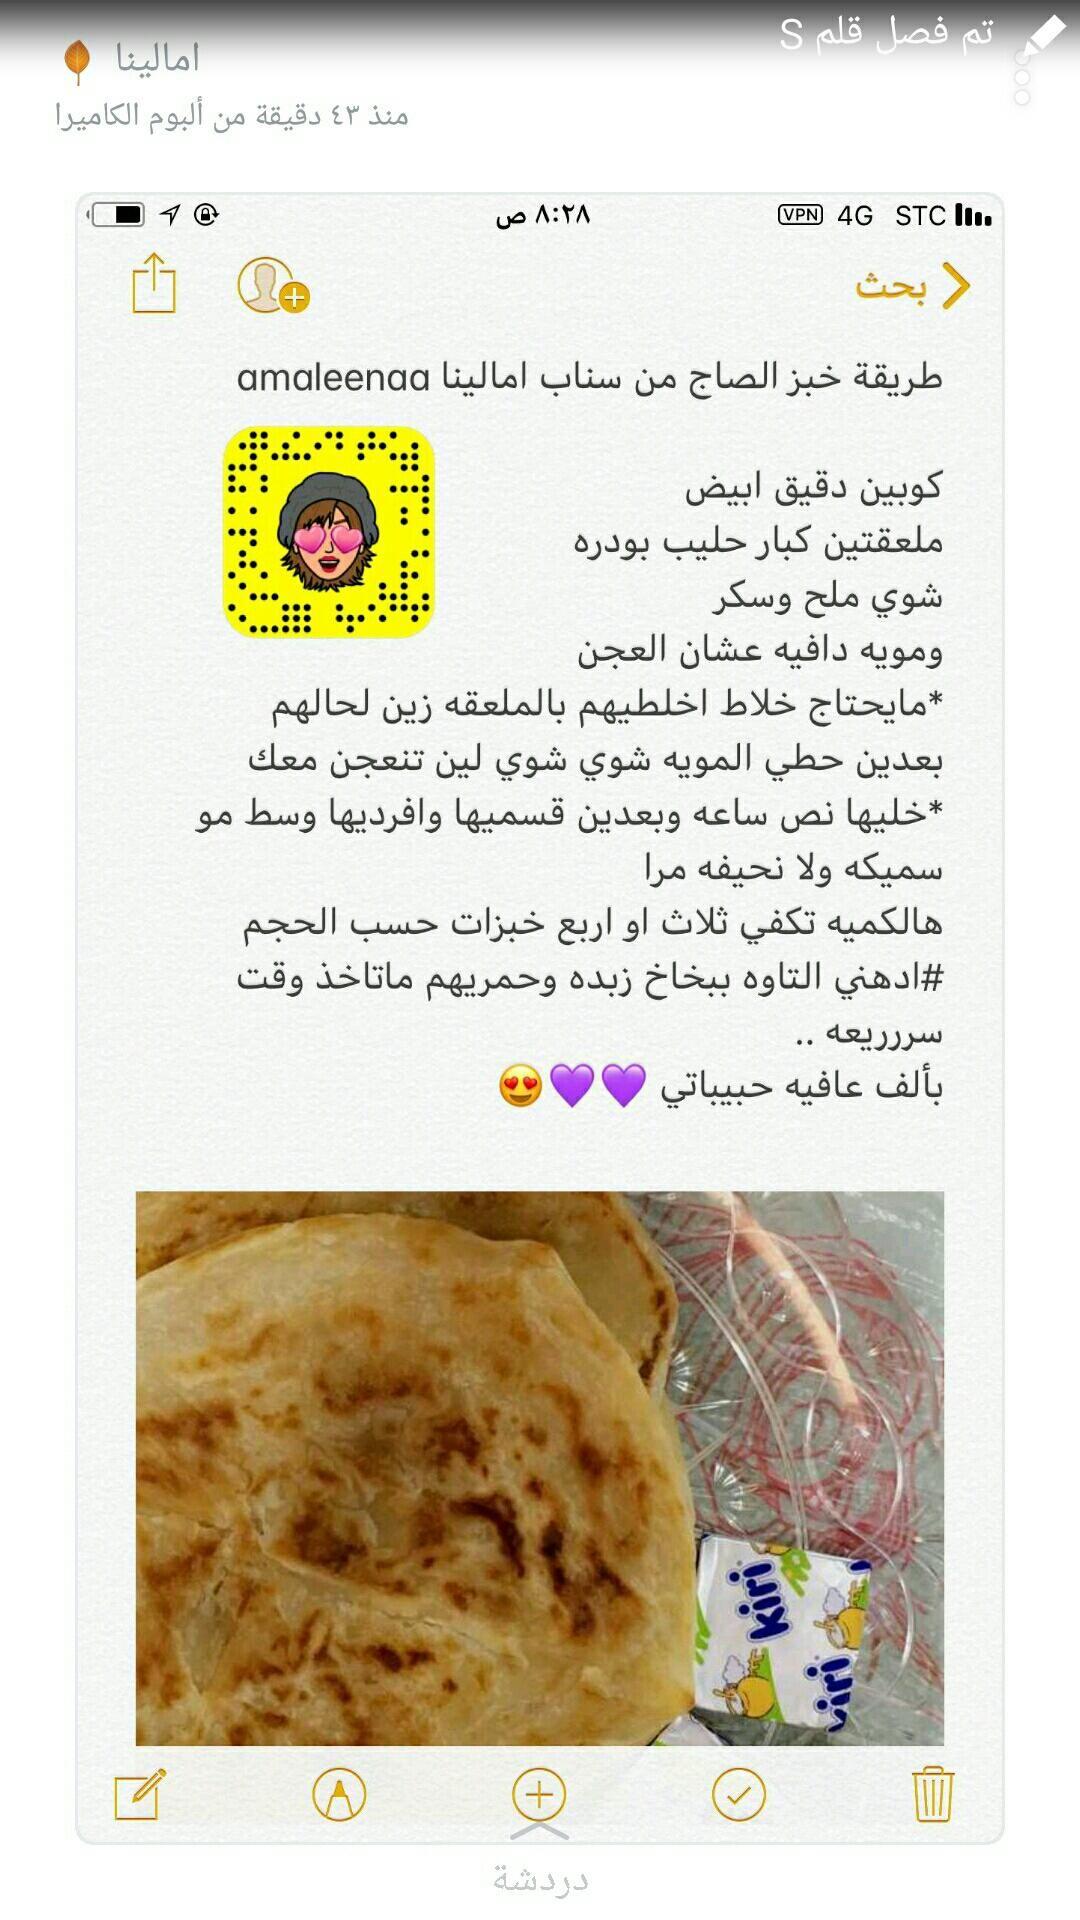 خبز صاج Yummy Food Food Wallpaper Arabic Food